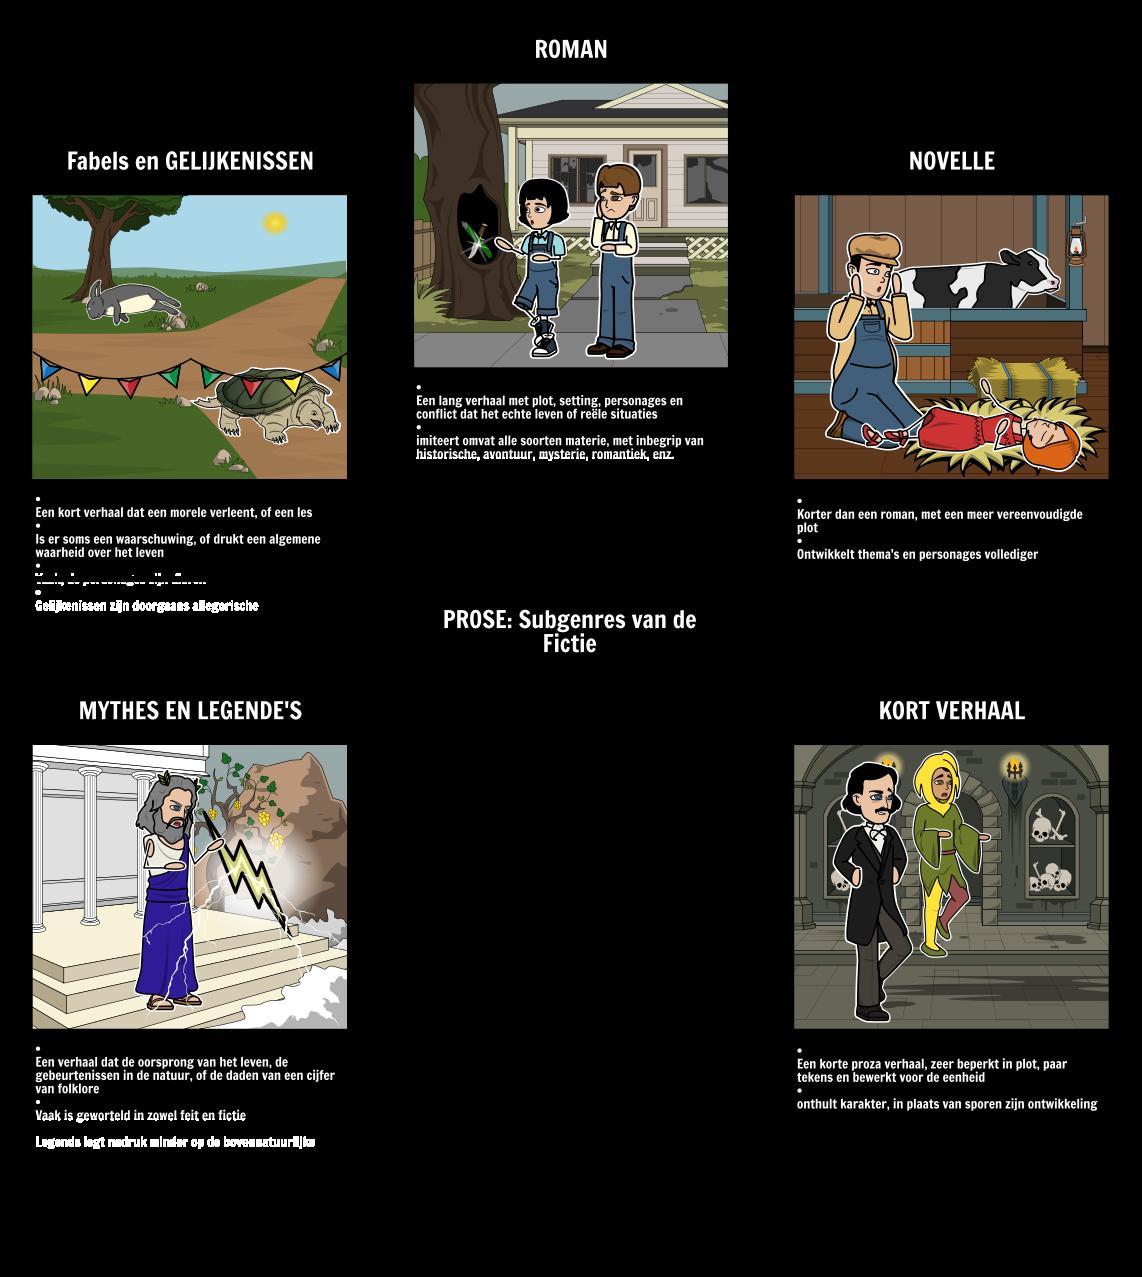 Proza: Sub-genres van Fictie